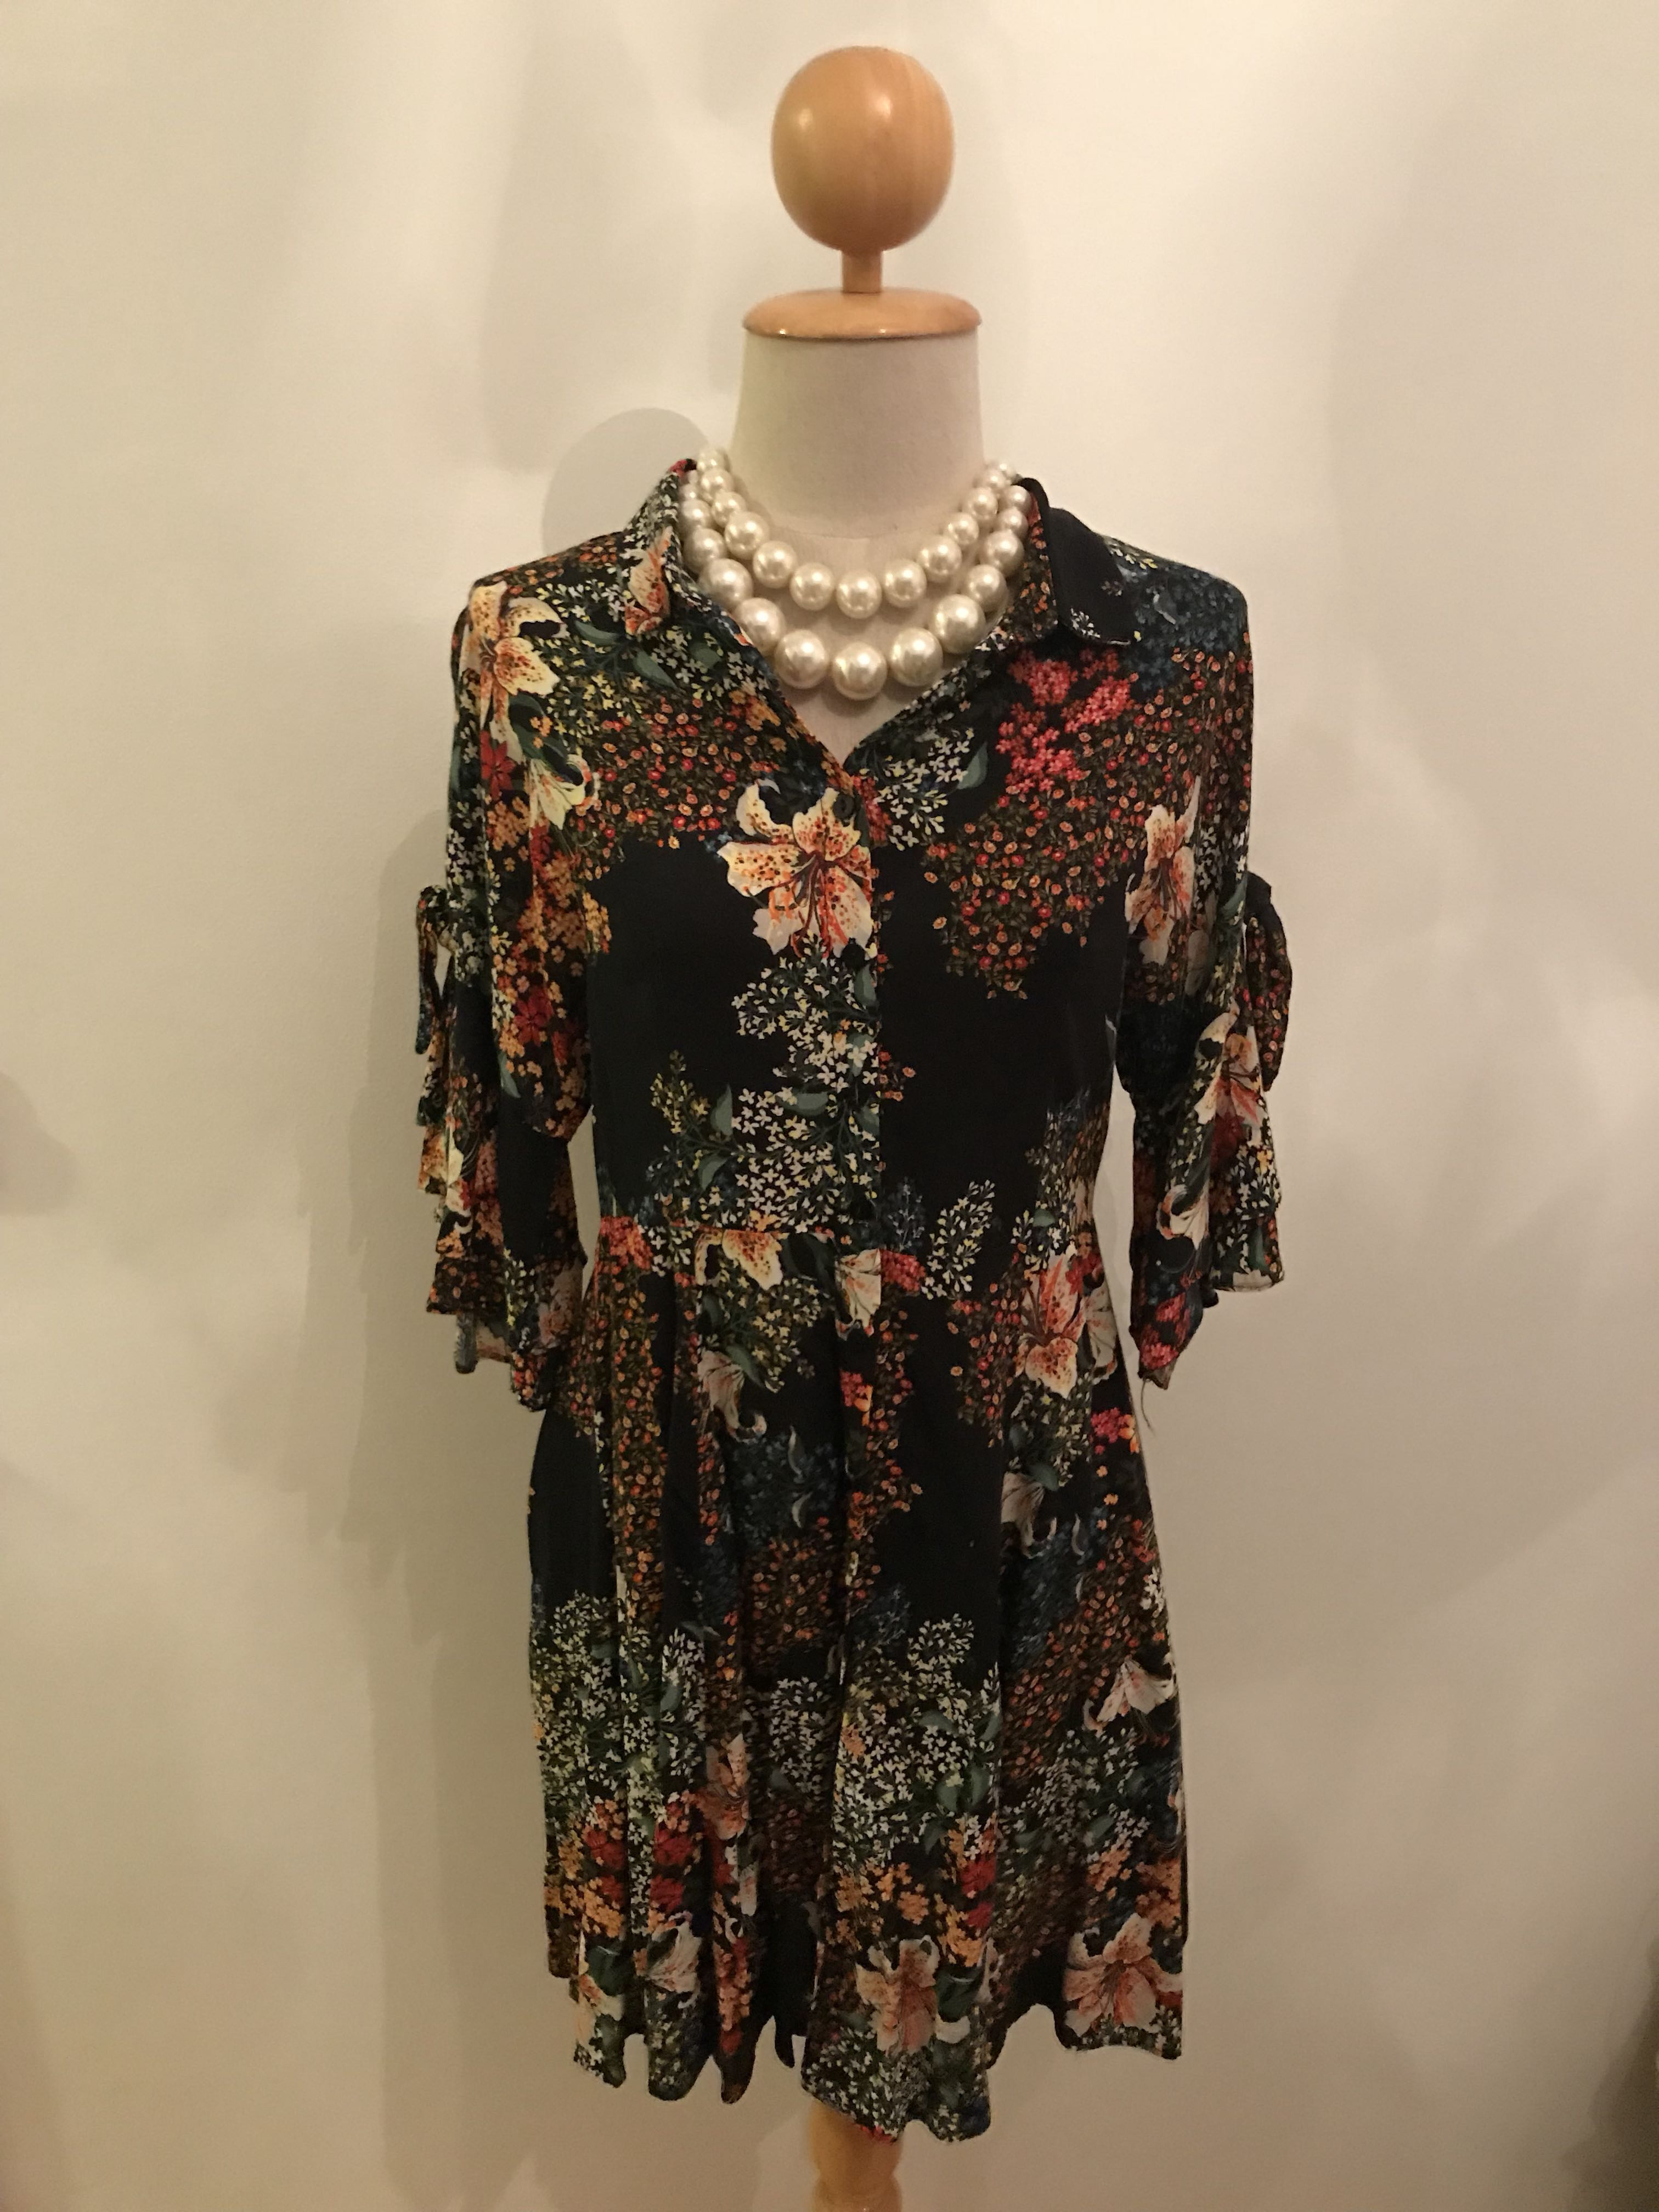 953b0906 Summer Dresses Uk Zara